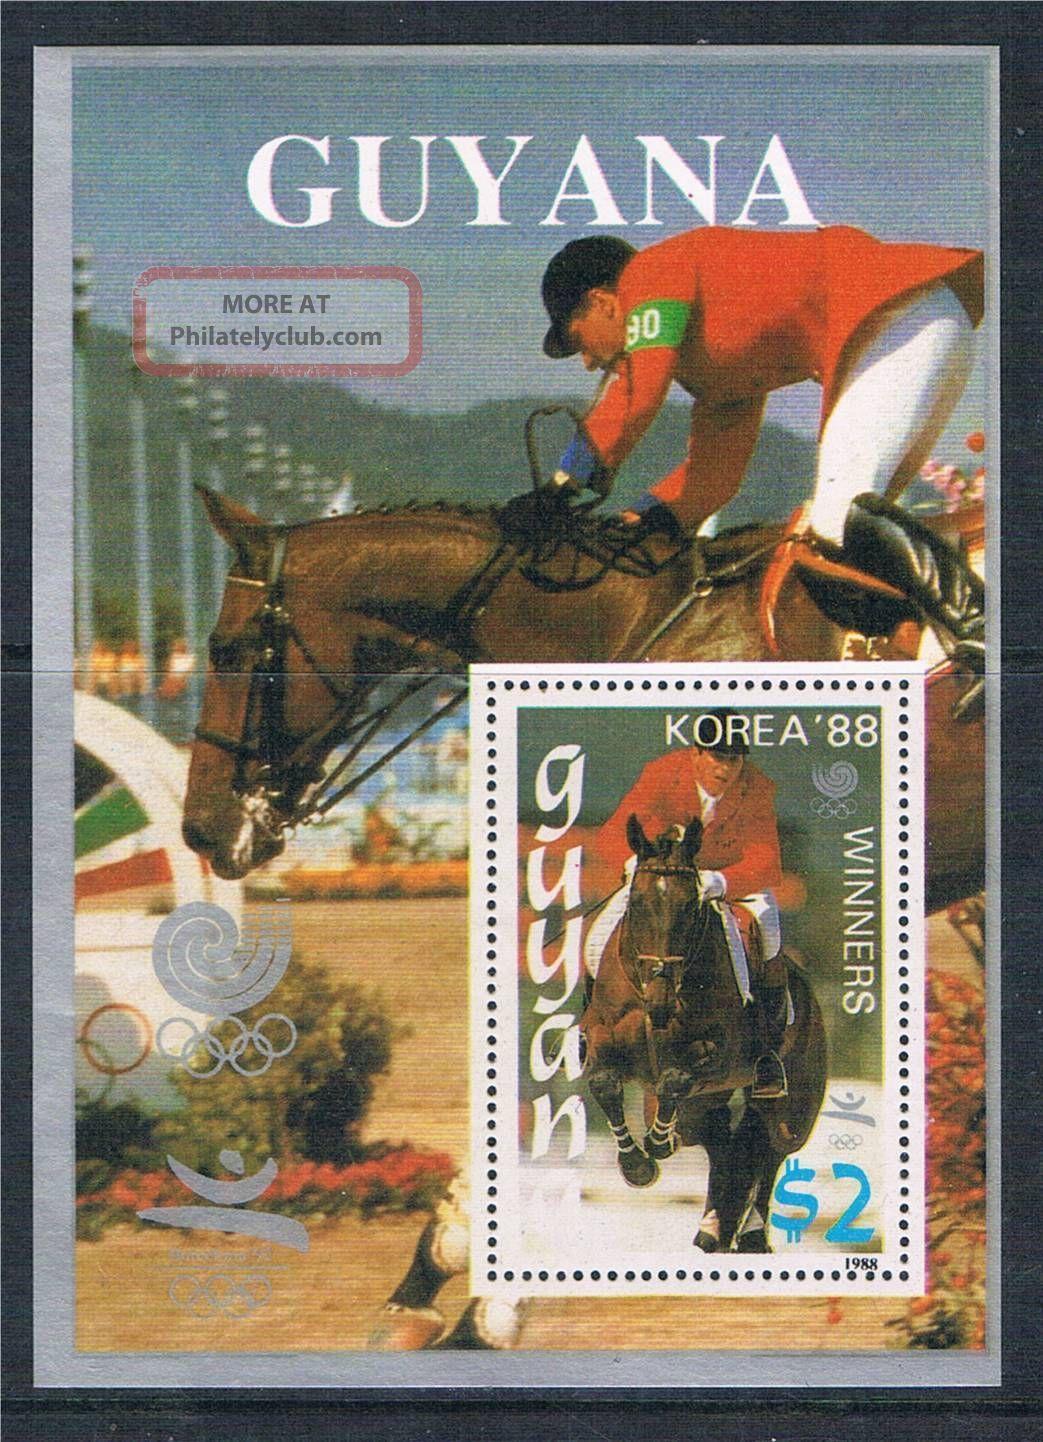 Guyana 1988 Olympics Ms Silver 2016 Latin America photo